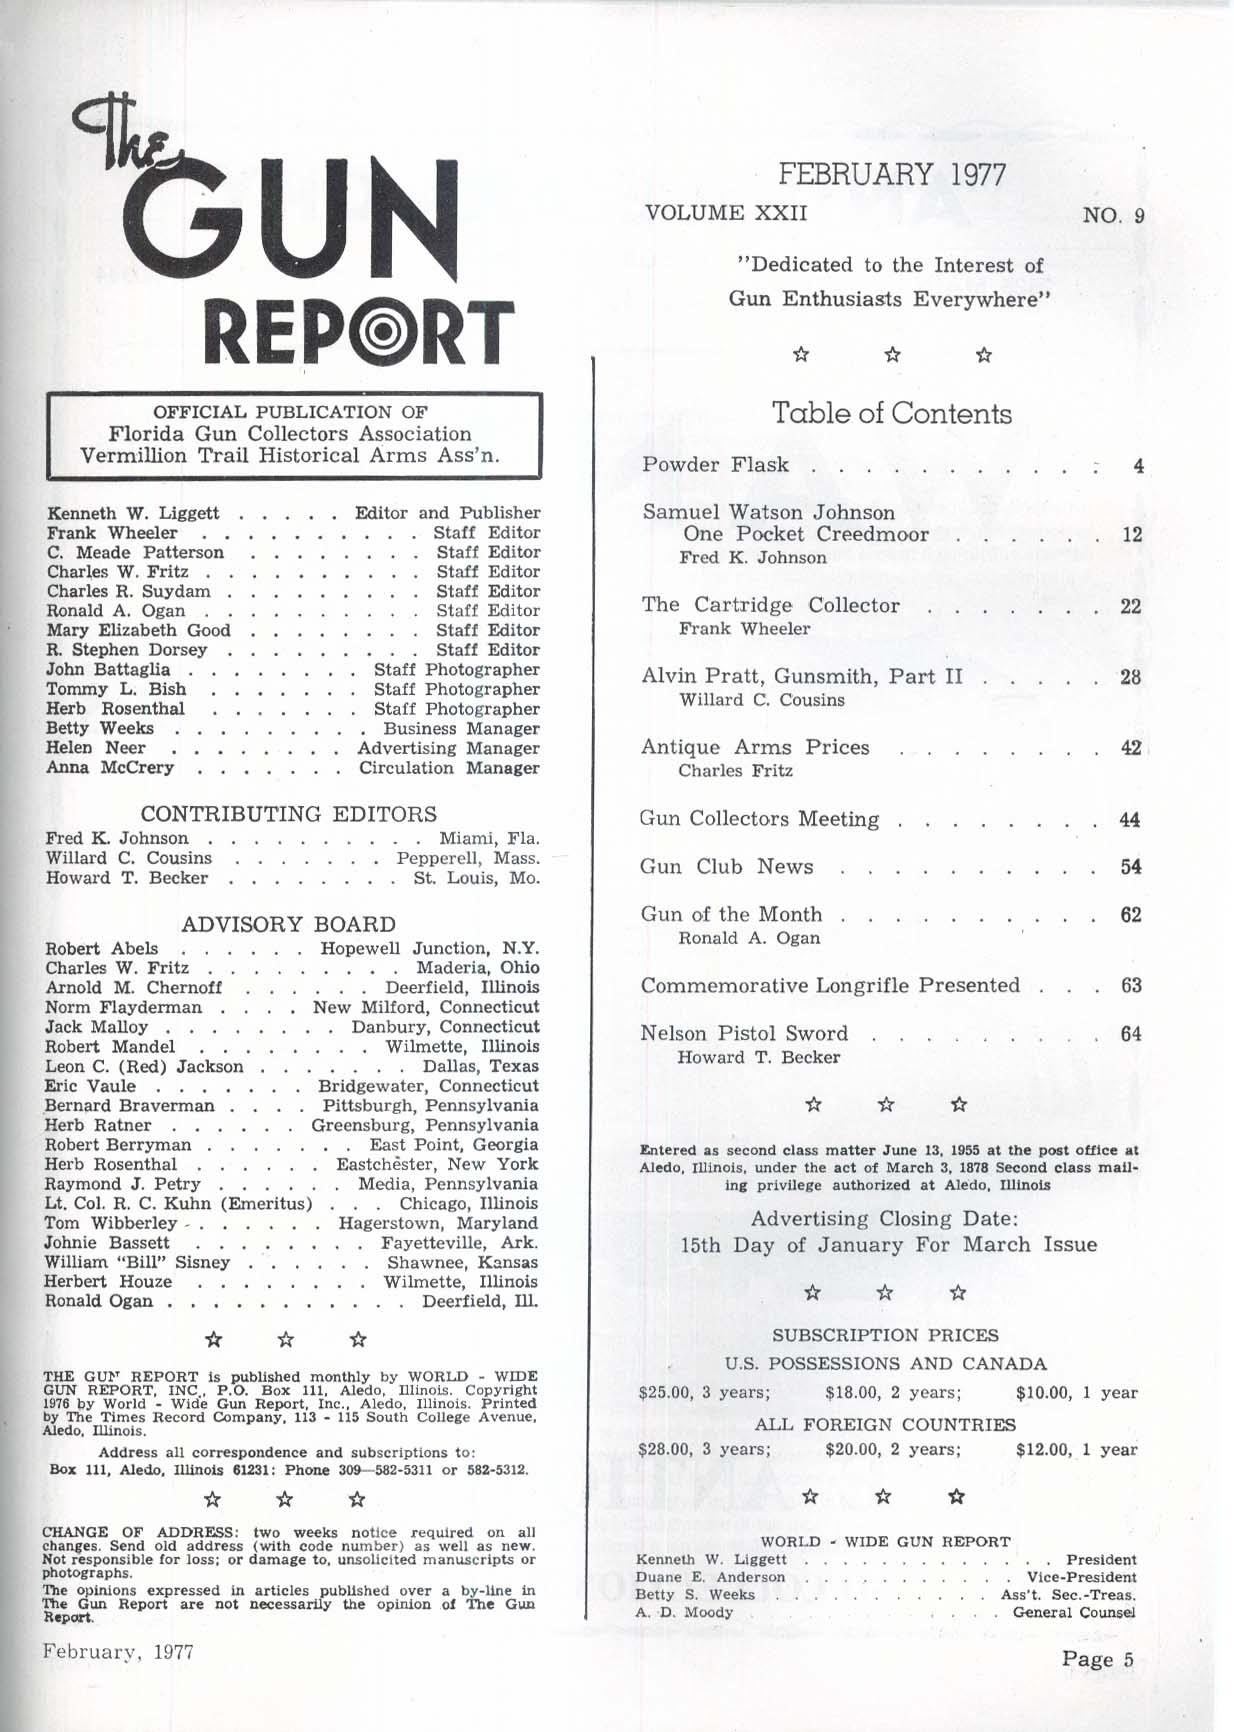 GUN REPORT Samuel Watson Johnson Creedmoor horation Nelson Pistol Sword 2 1977